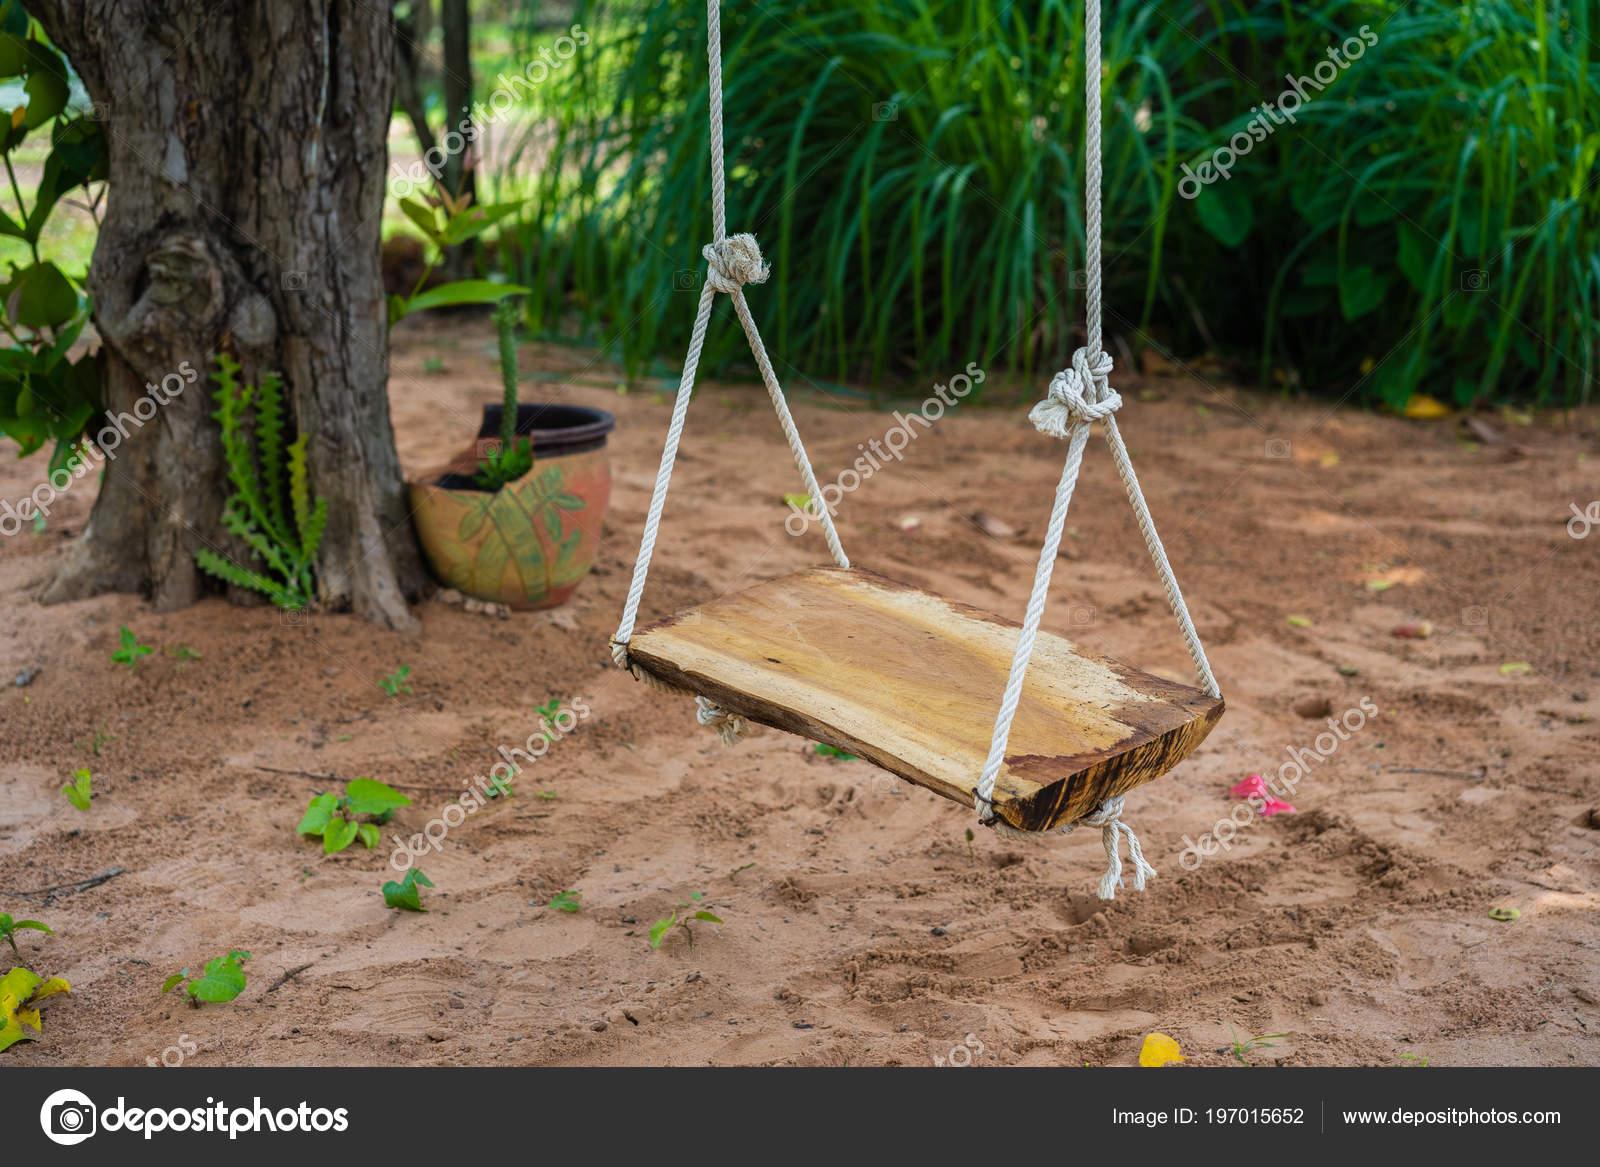 Schommel Voor Tuin : Houten schommel tuin u stockfoto geargodz